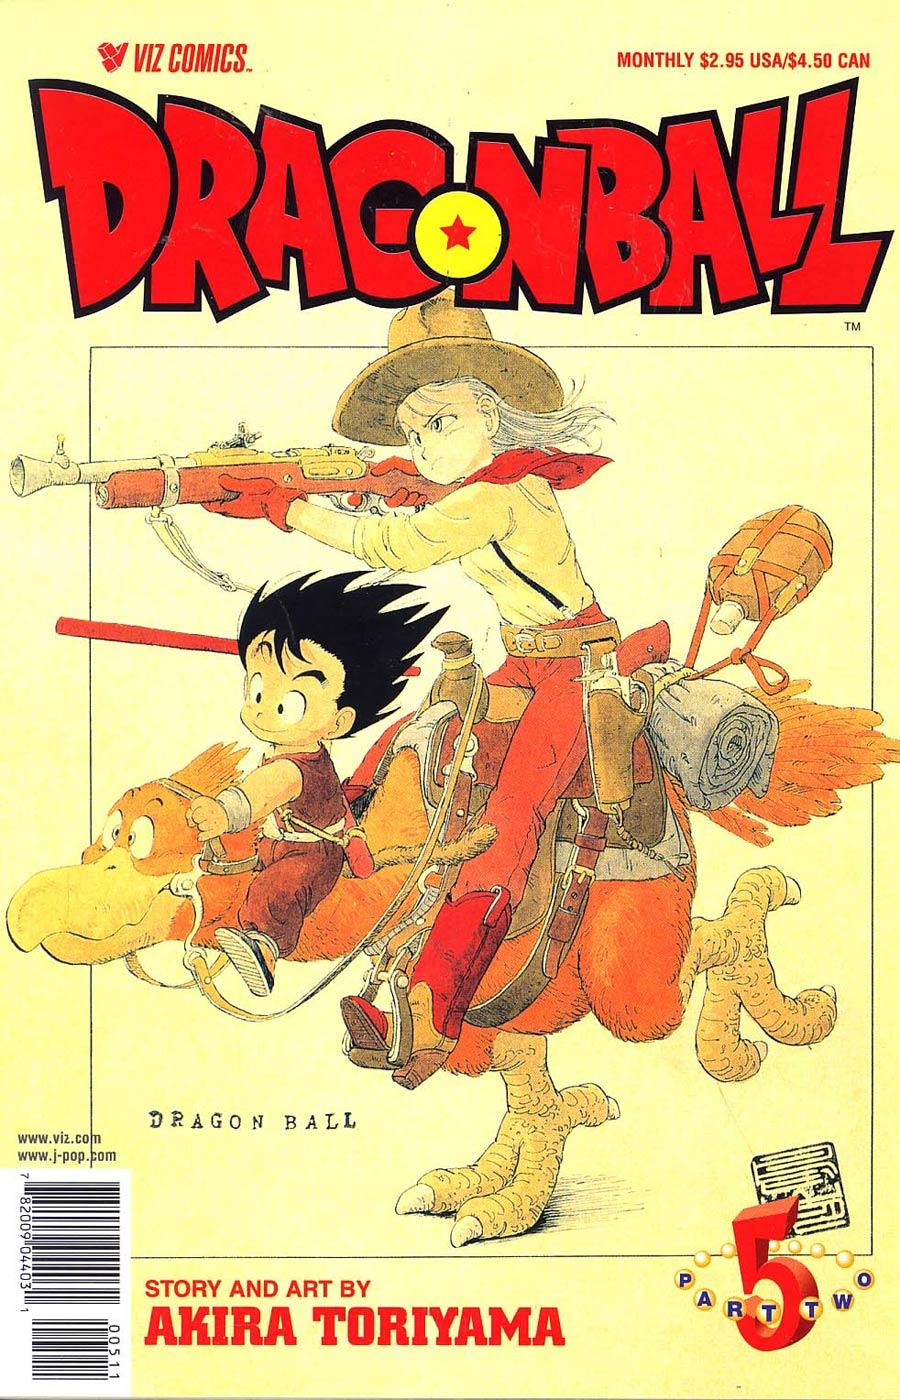 Dragon Ball Part 2 #5